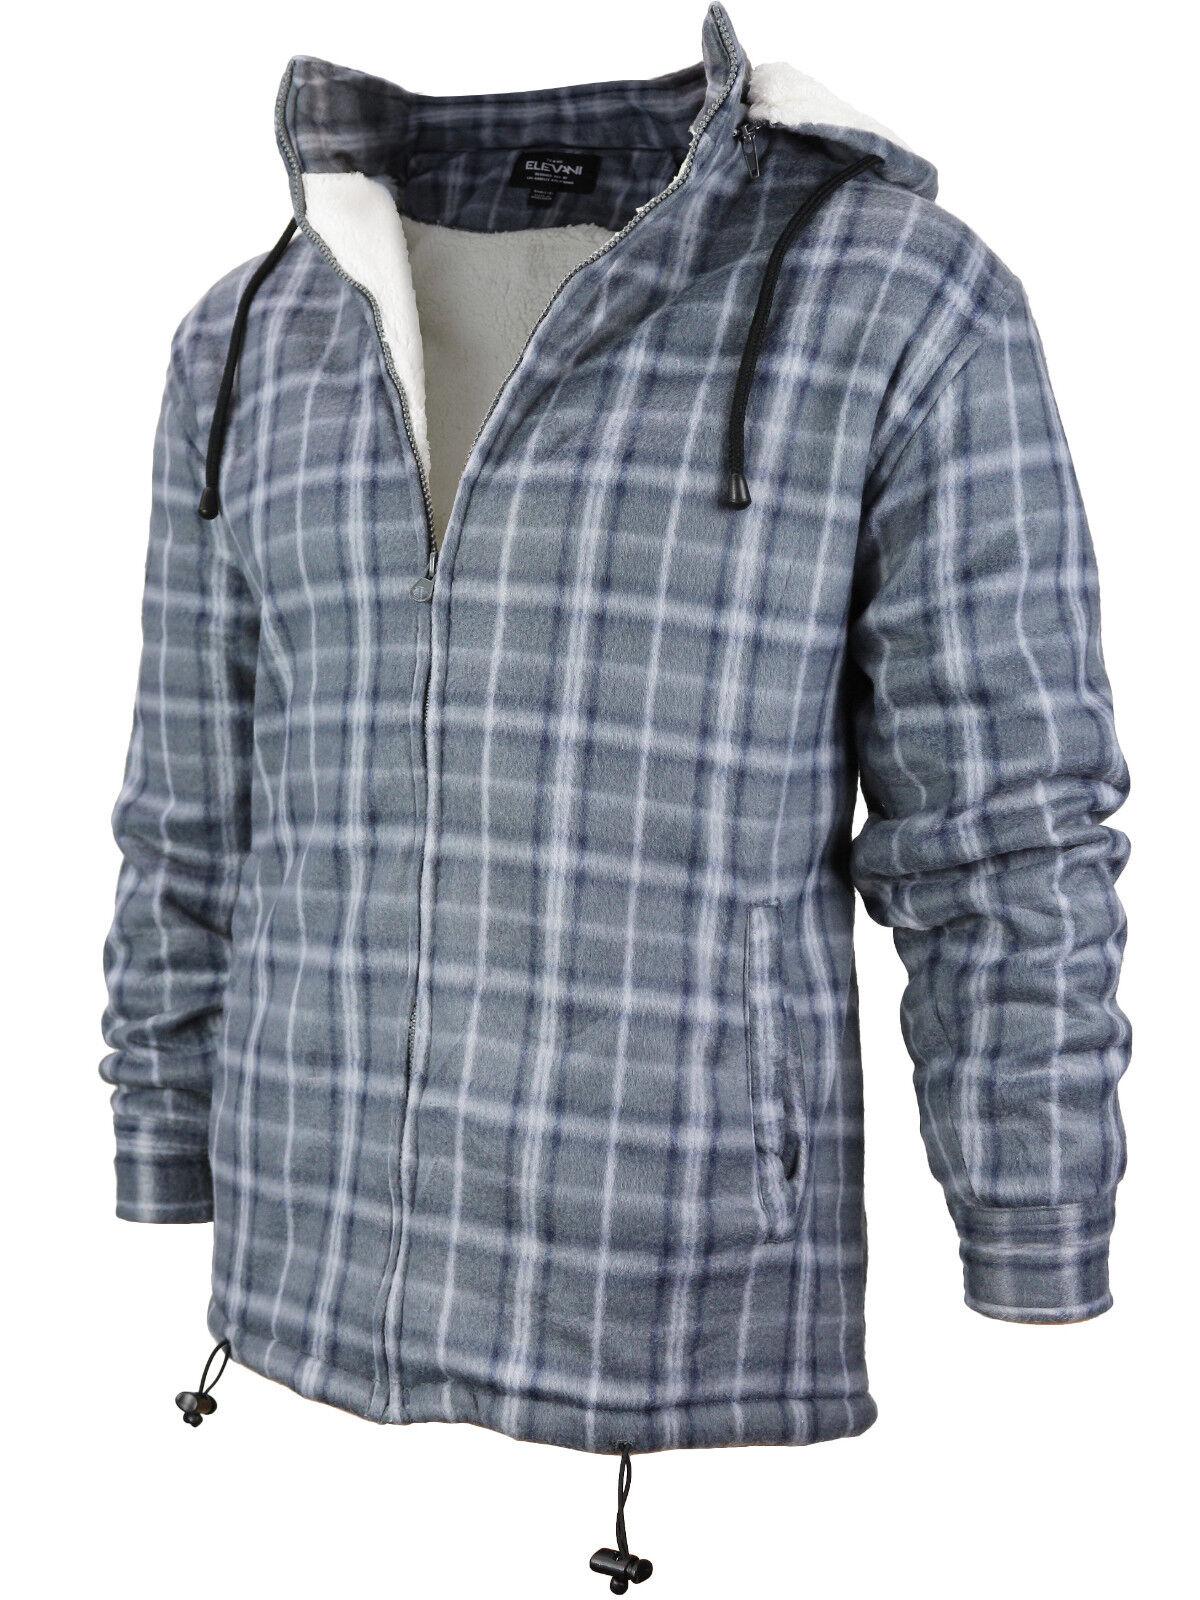 Men's Heavy Fleece Lined Sherpa Hoodie Plaid Flannel Jacket With Hood P2 - Grey Navy